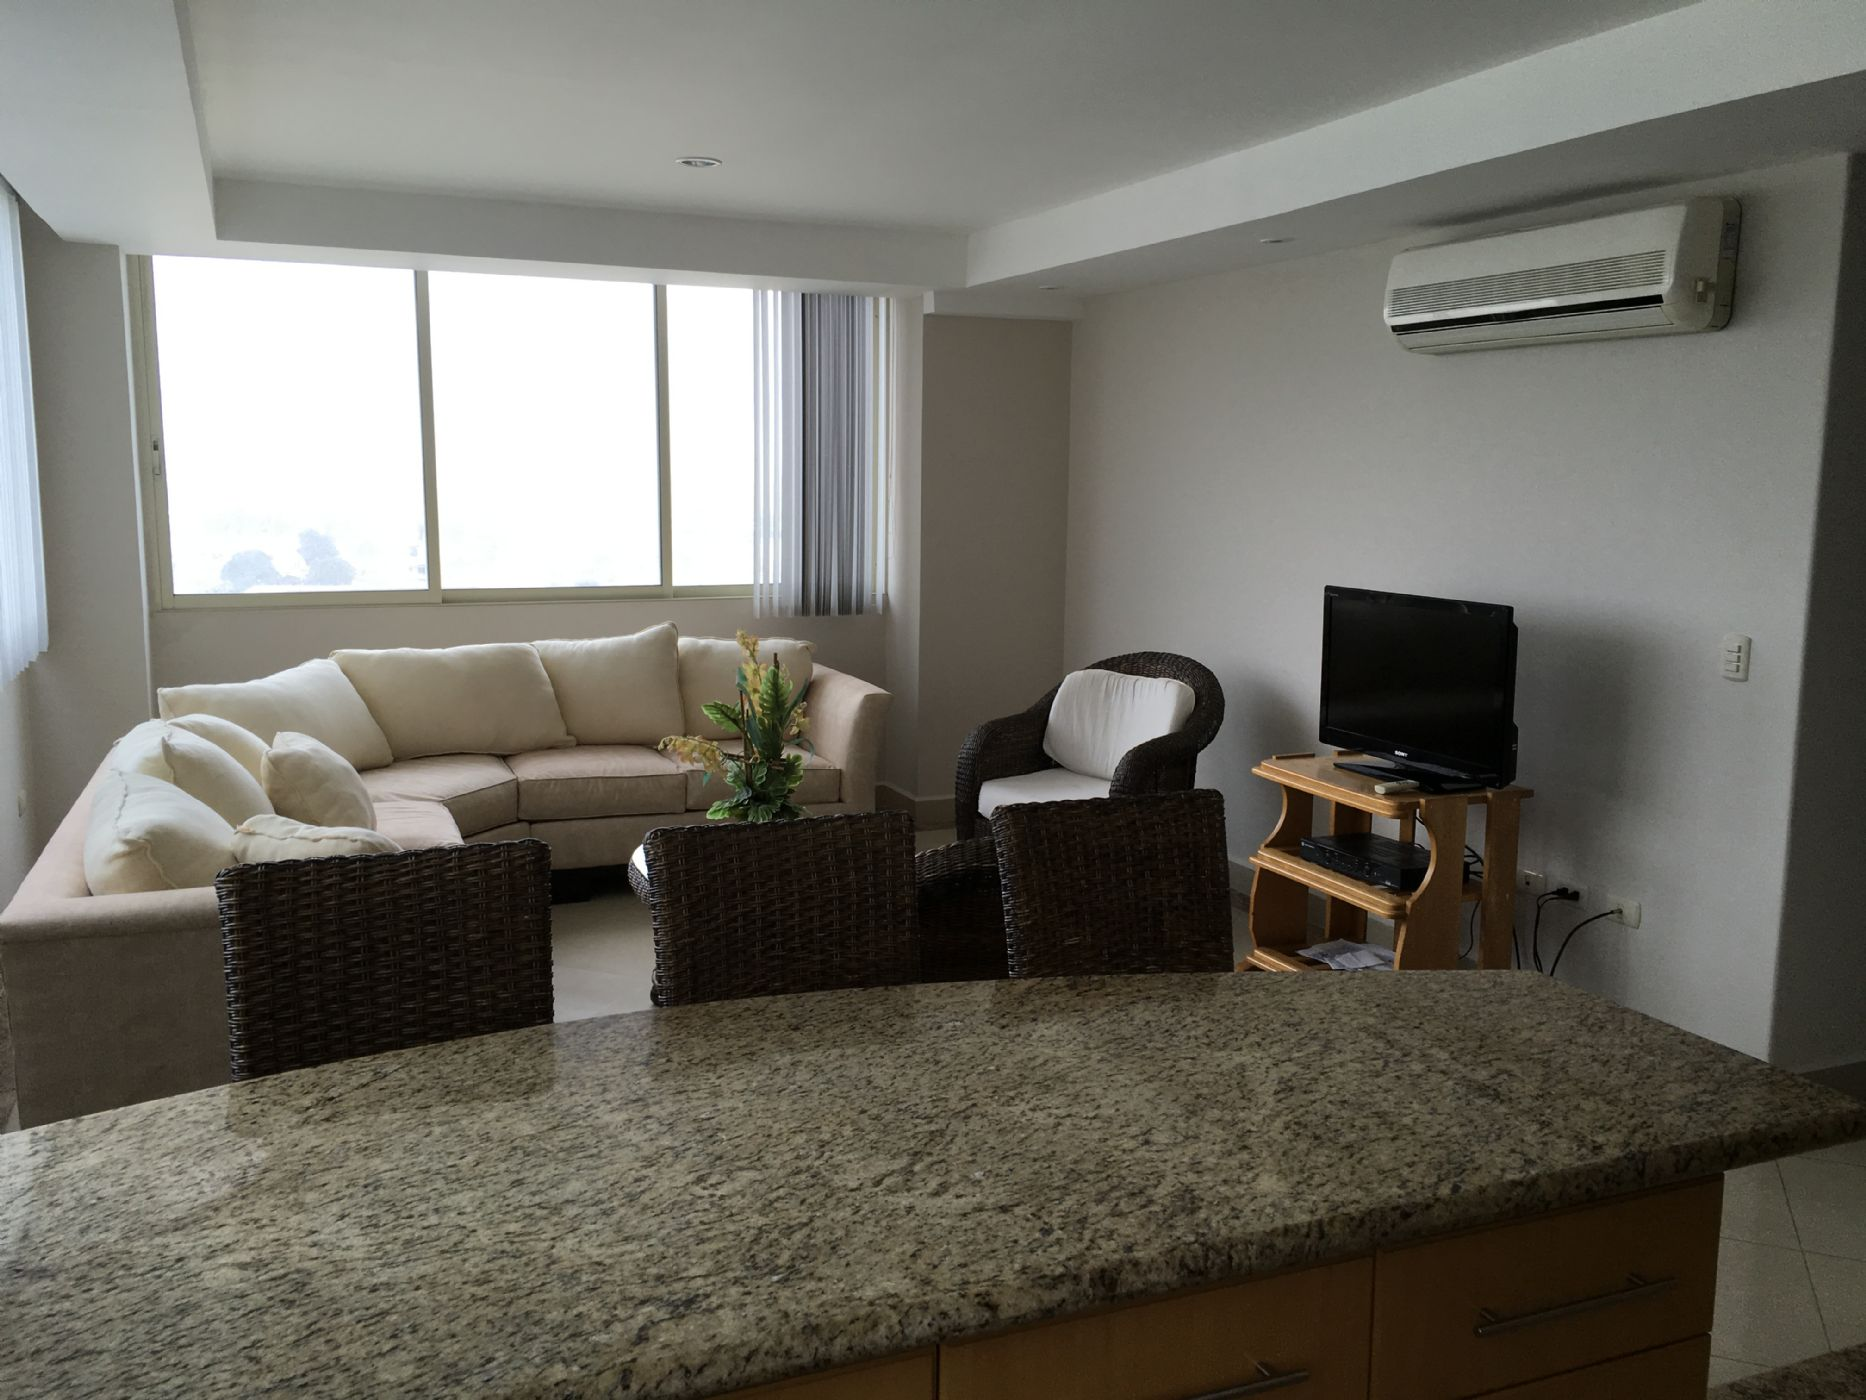 Salinas-Ecuador-property-511868-3.JPG